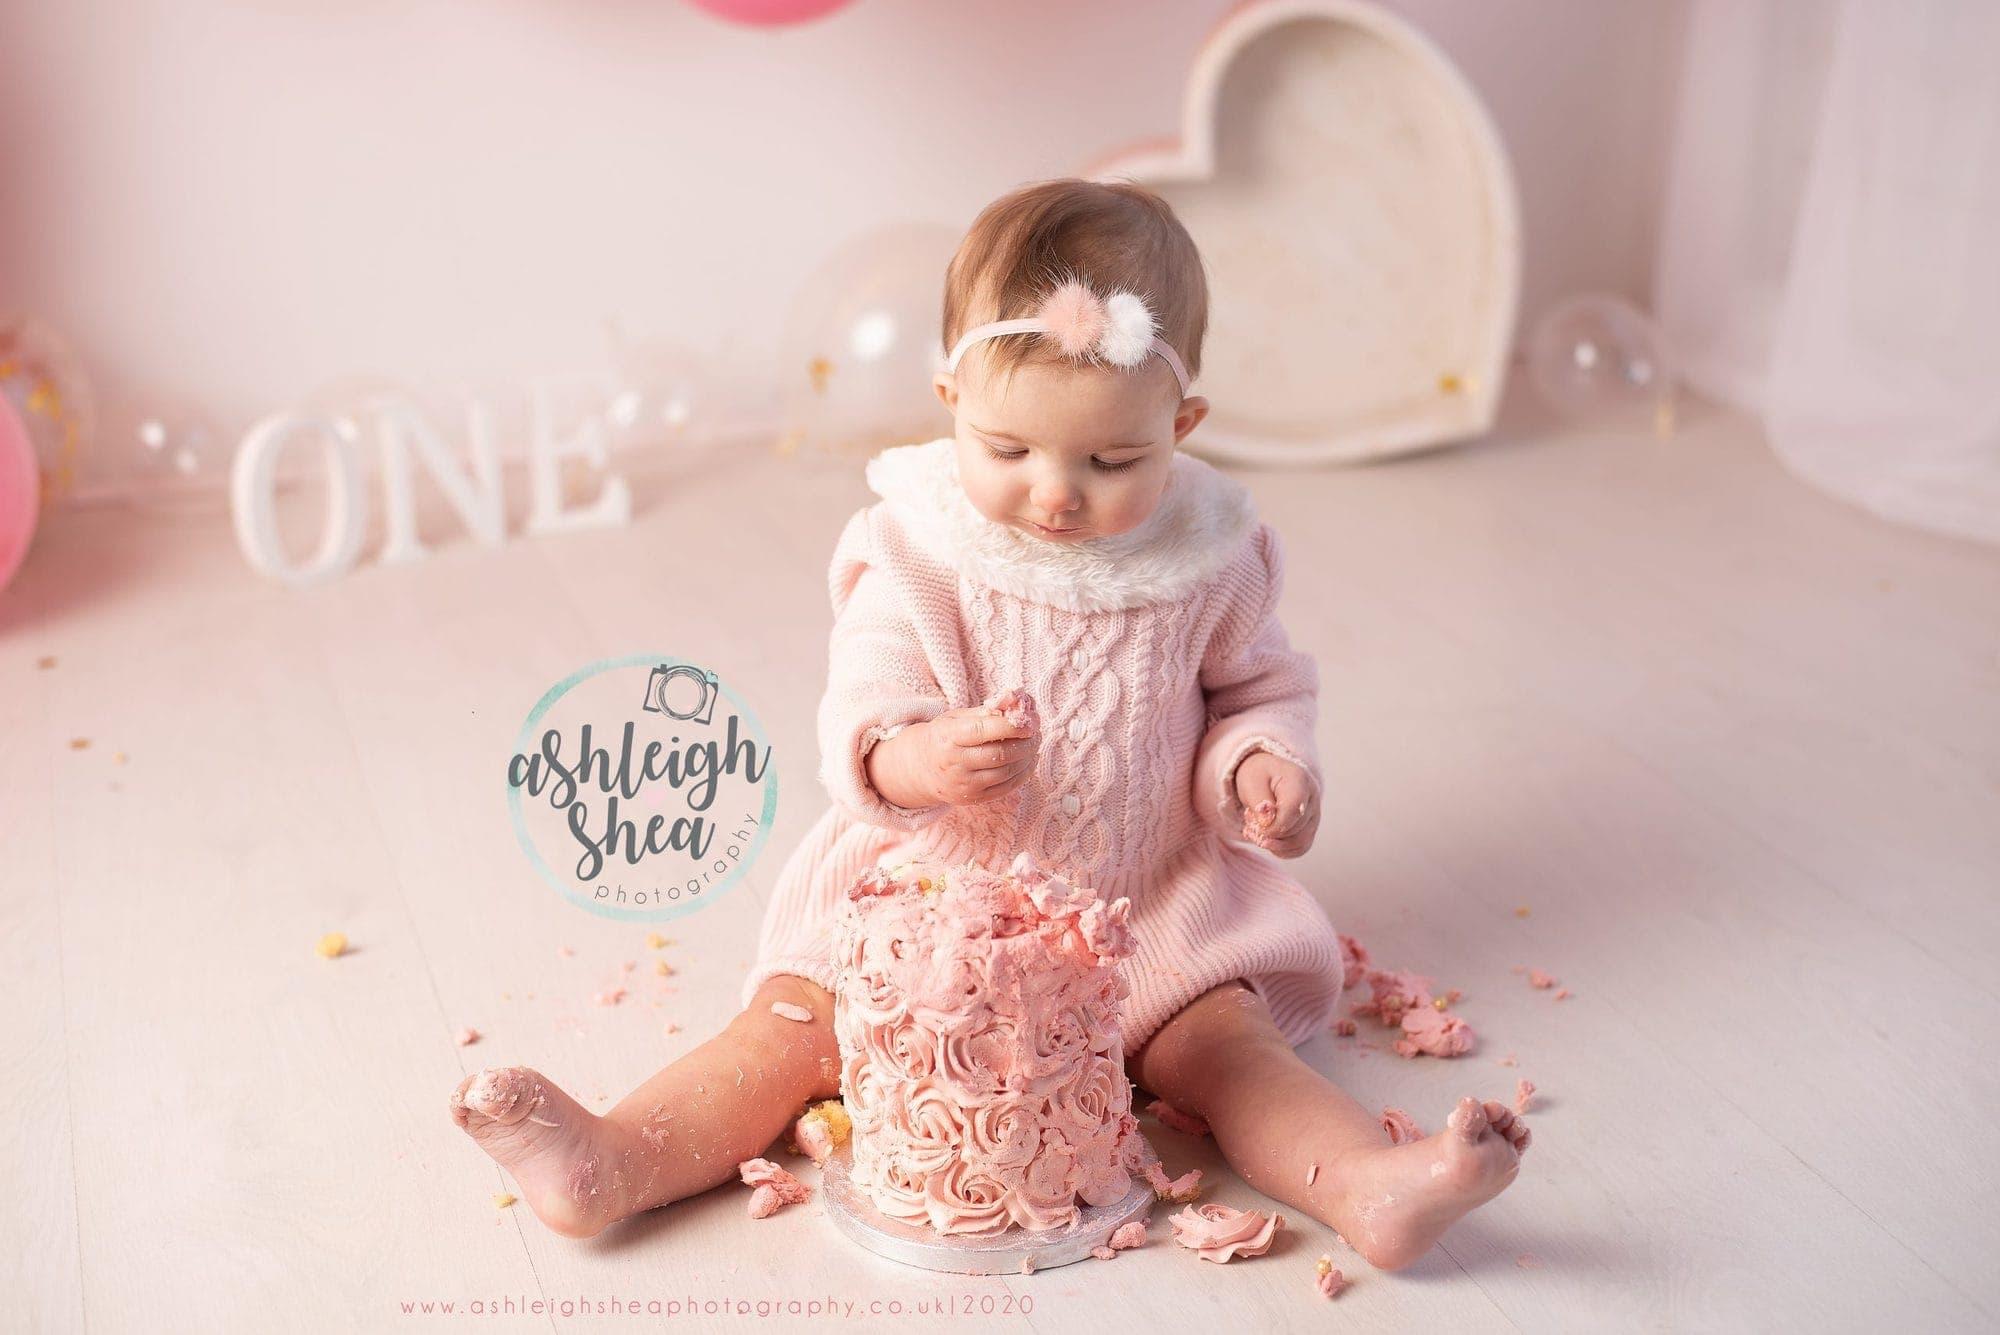 Pink Cake, Smash Cake, One, Ashleigh Shea Photography, London, Sidcup